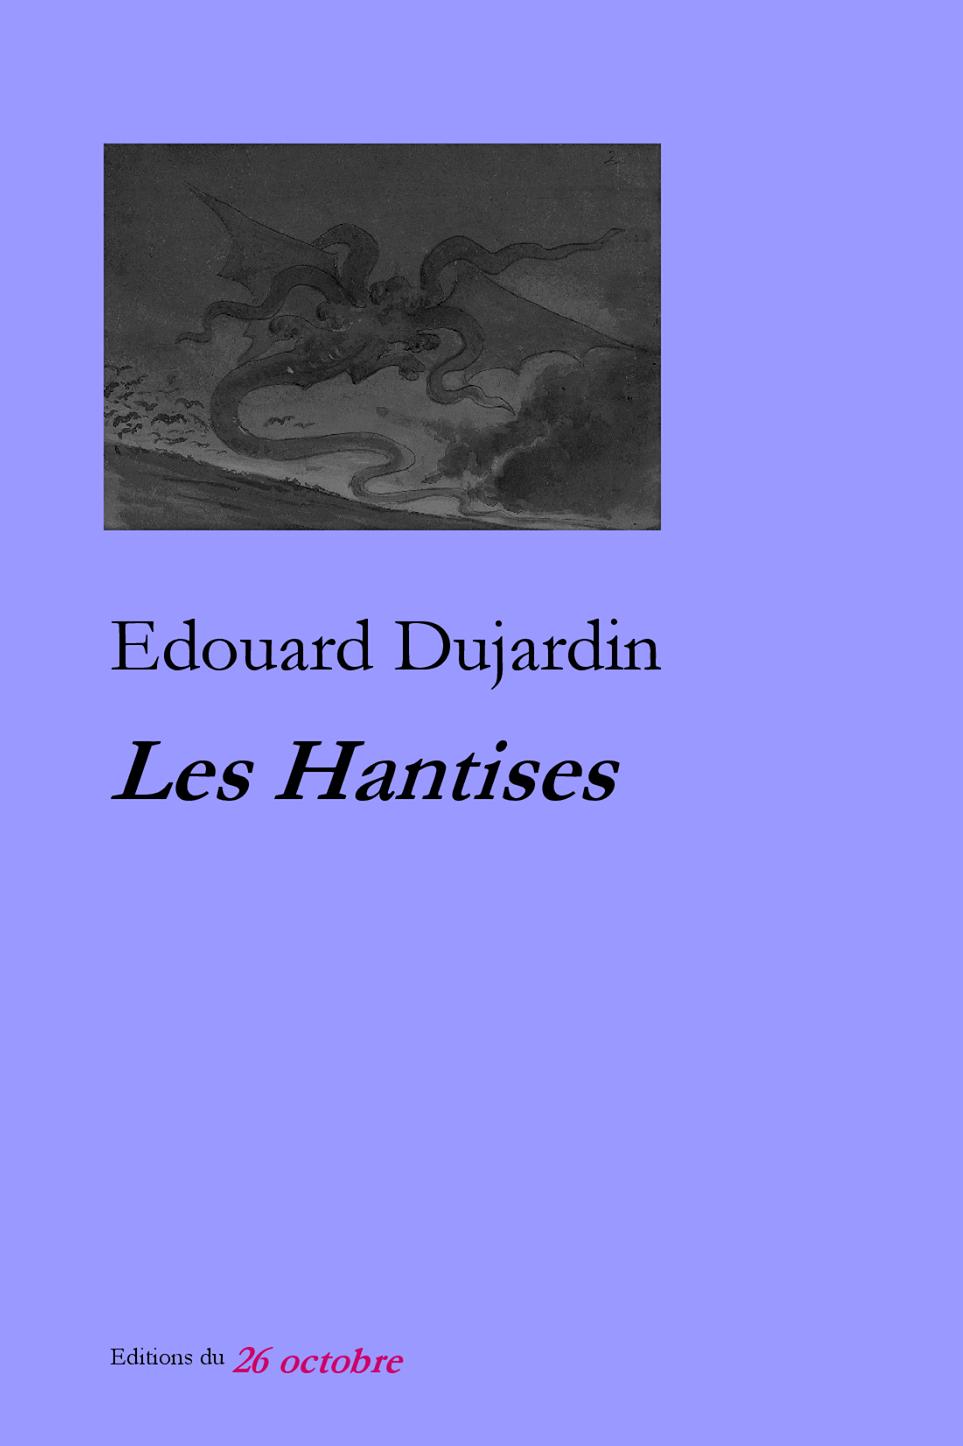 Les Hantises de Edouard Dujardin.